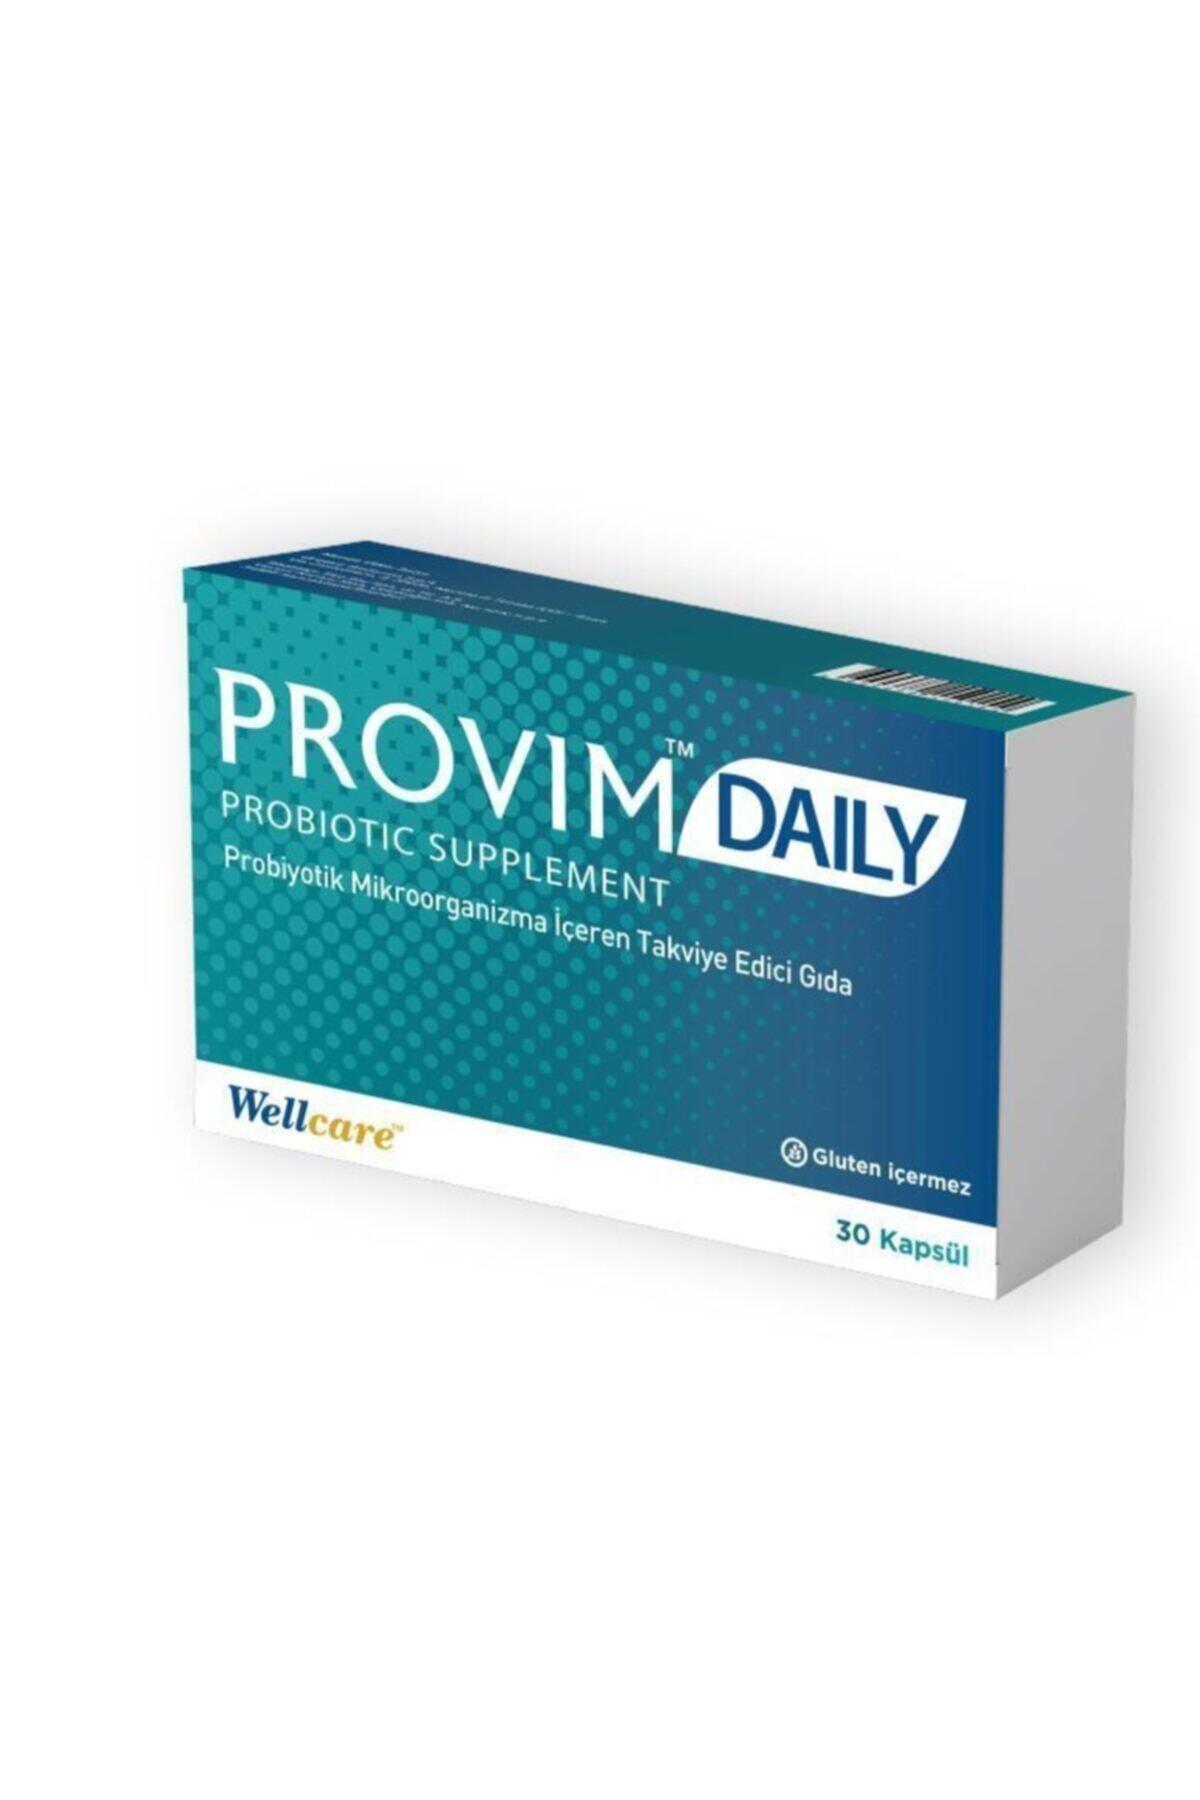 Wellcare Provim Daily 30 Kapsül Probiyotik 1